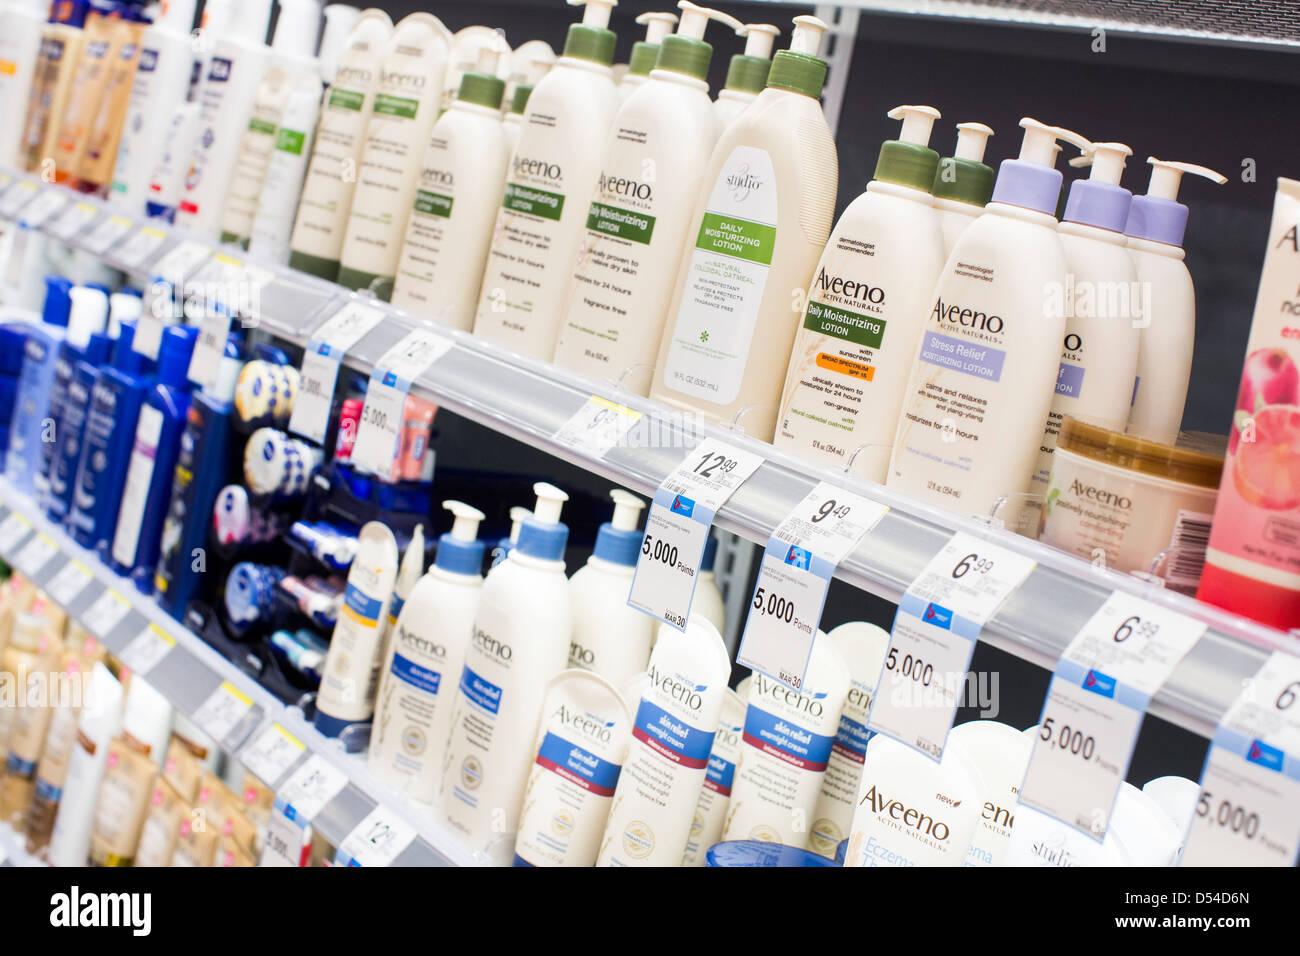 Aveeno lotion on display at a Walgreens Flagship store in downtown Washington, DC. - Stock Image